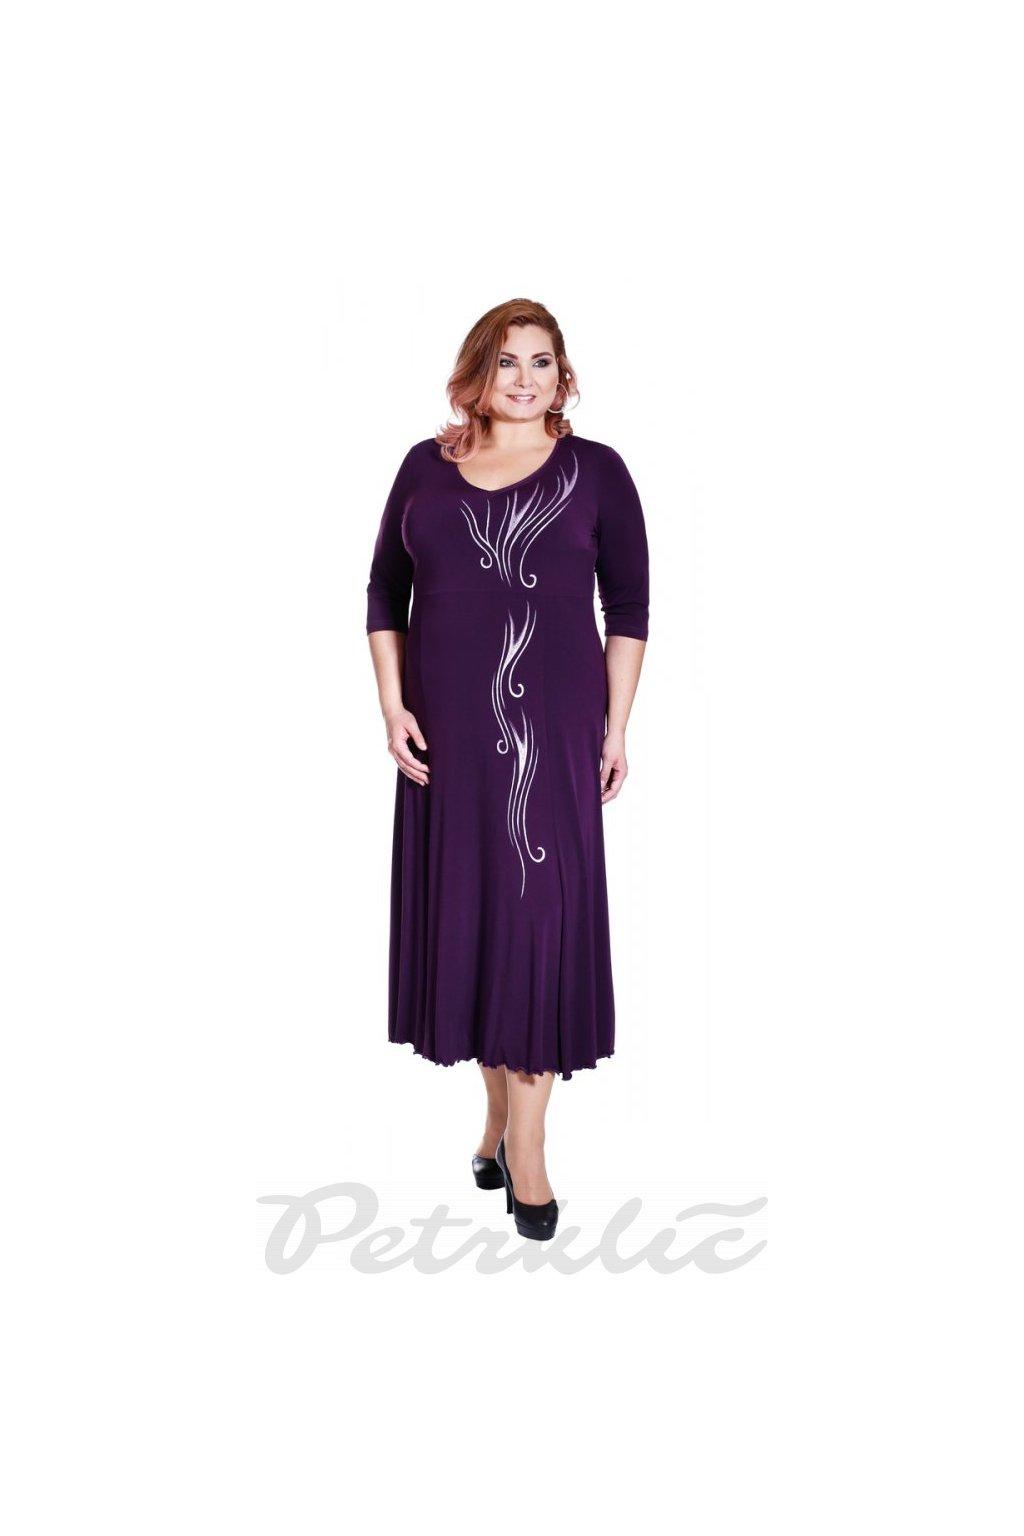 MÁJA - šaty s 3/4 rukávem 110 - 115 cm